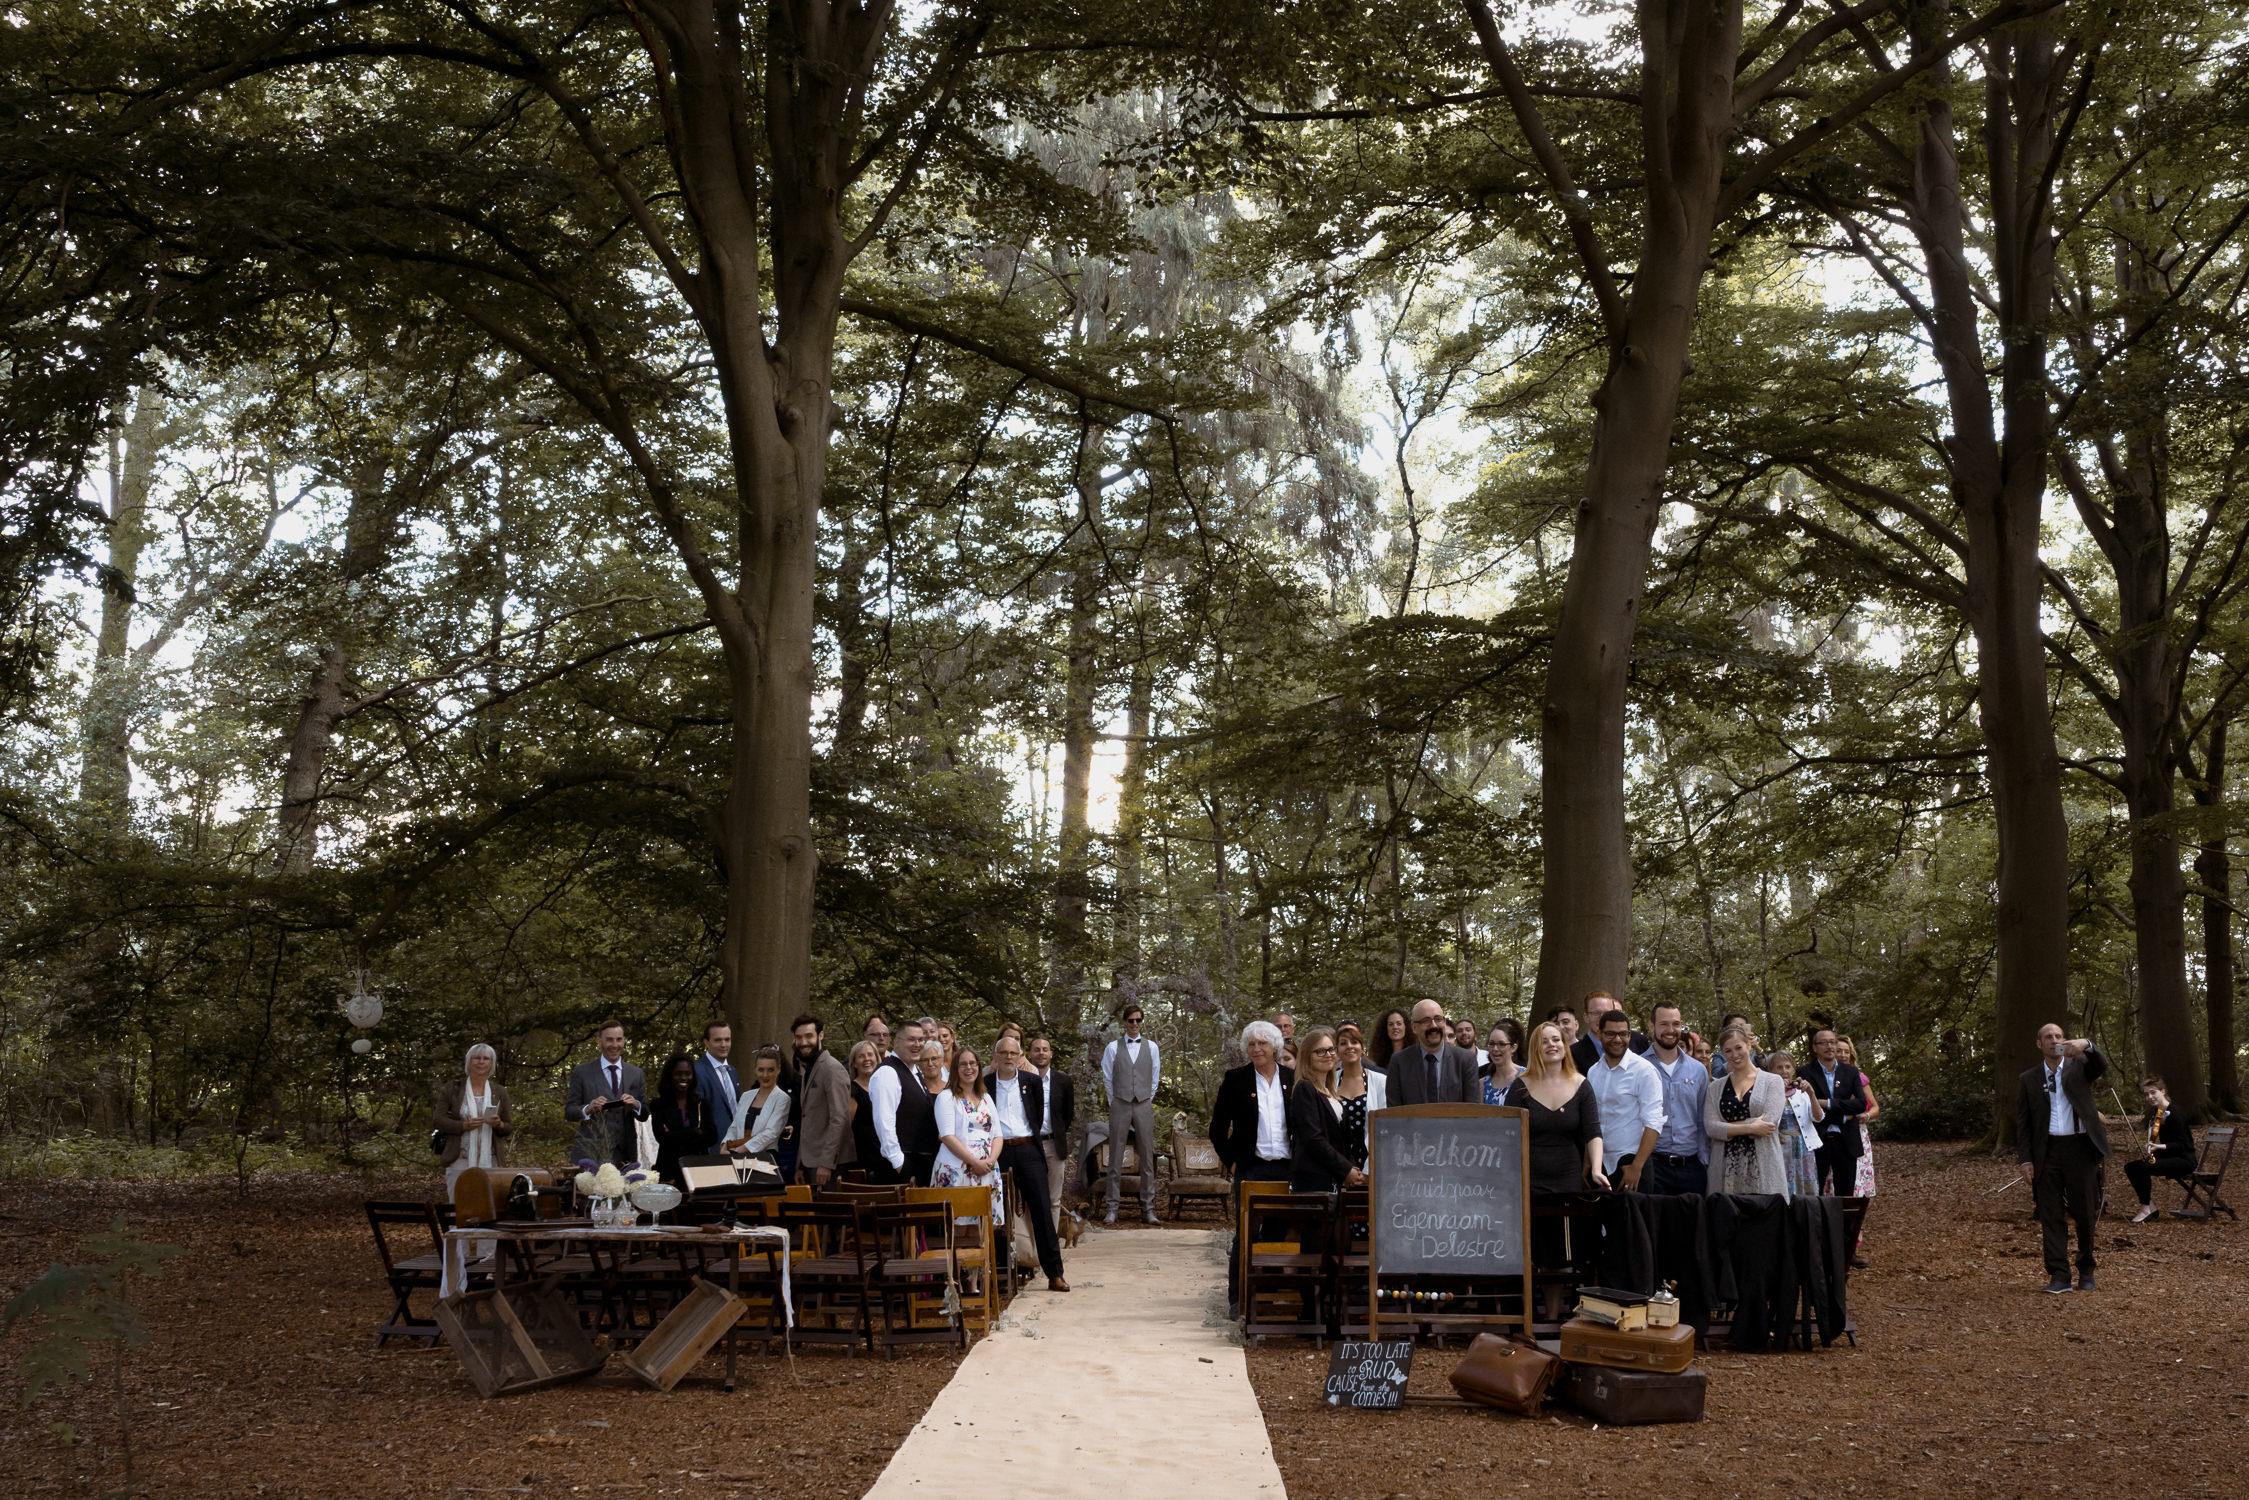 wedding in the forest near leusden by mark hadden amsterdam wedding photographer